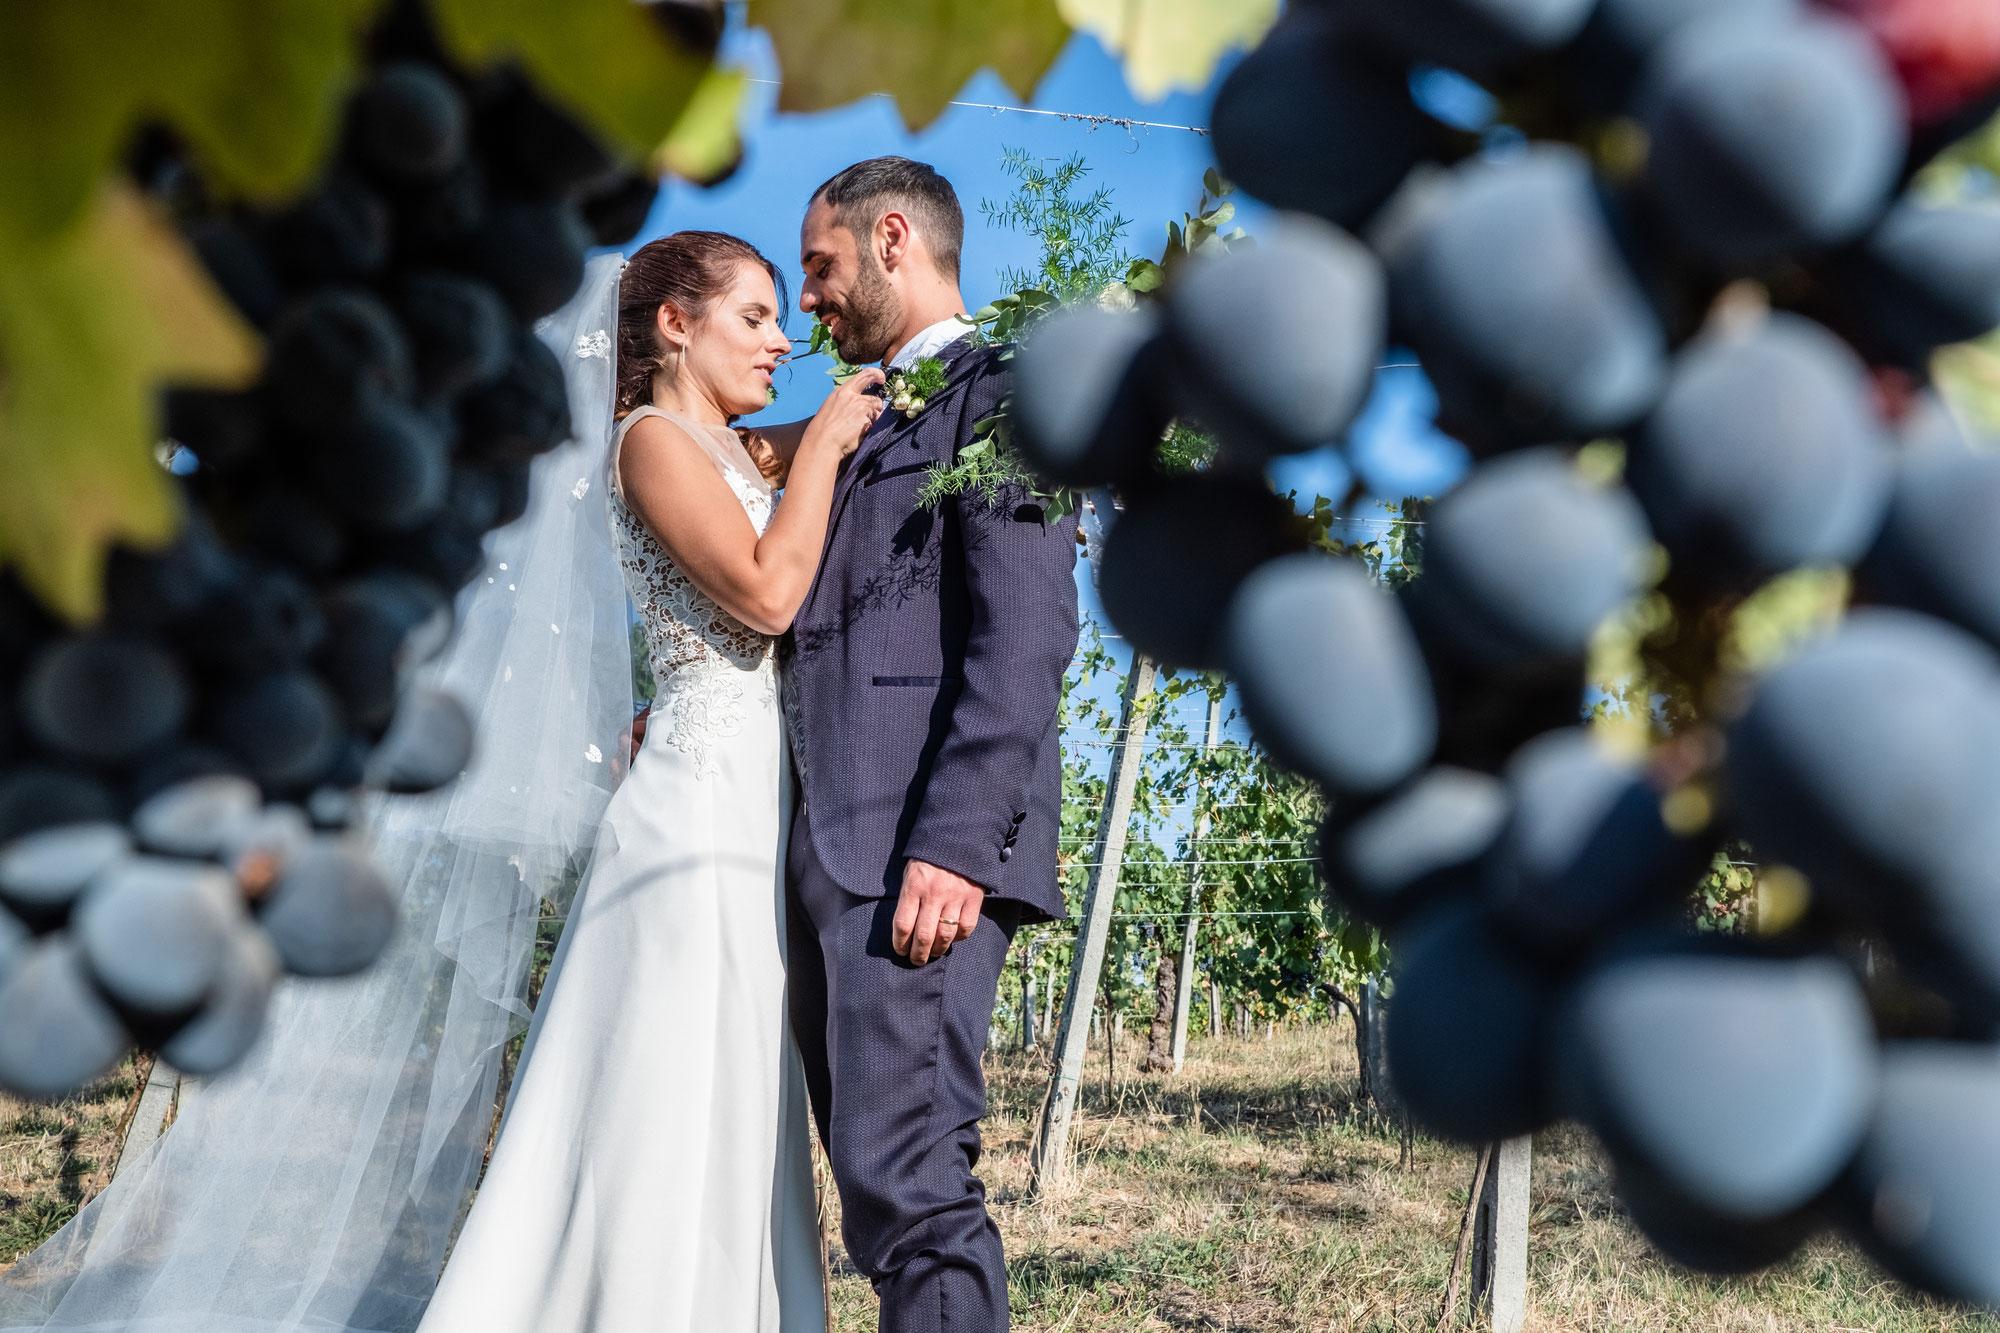 Fotografo Matrimonio Piacenza - Matrimonio Agriturismo La Tosa